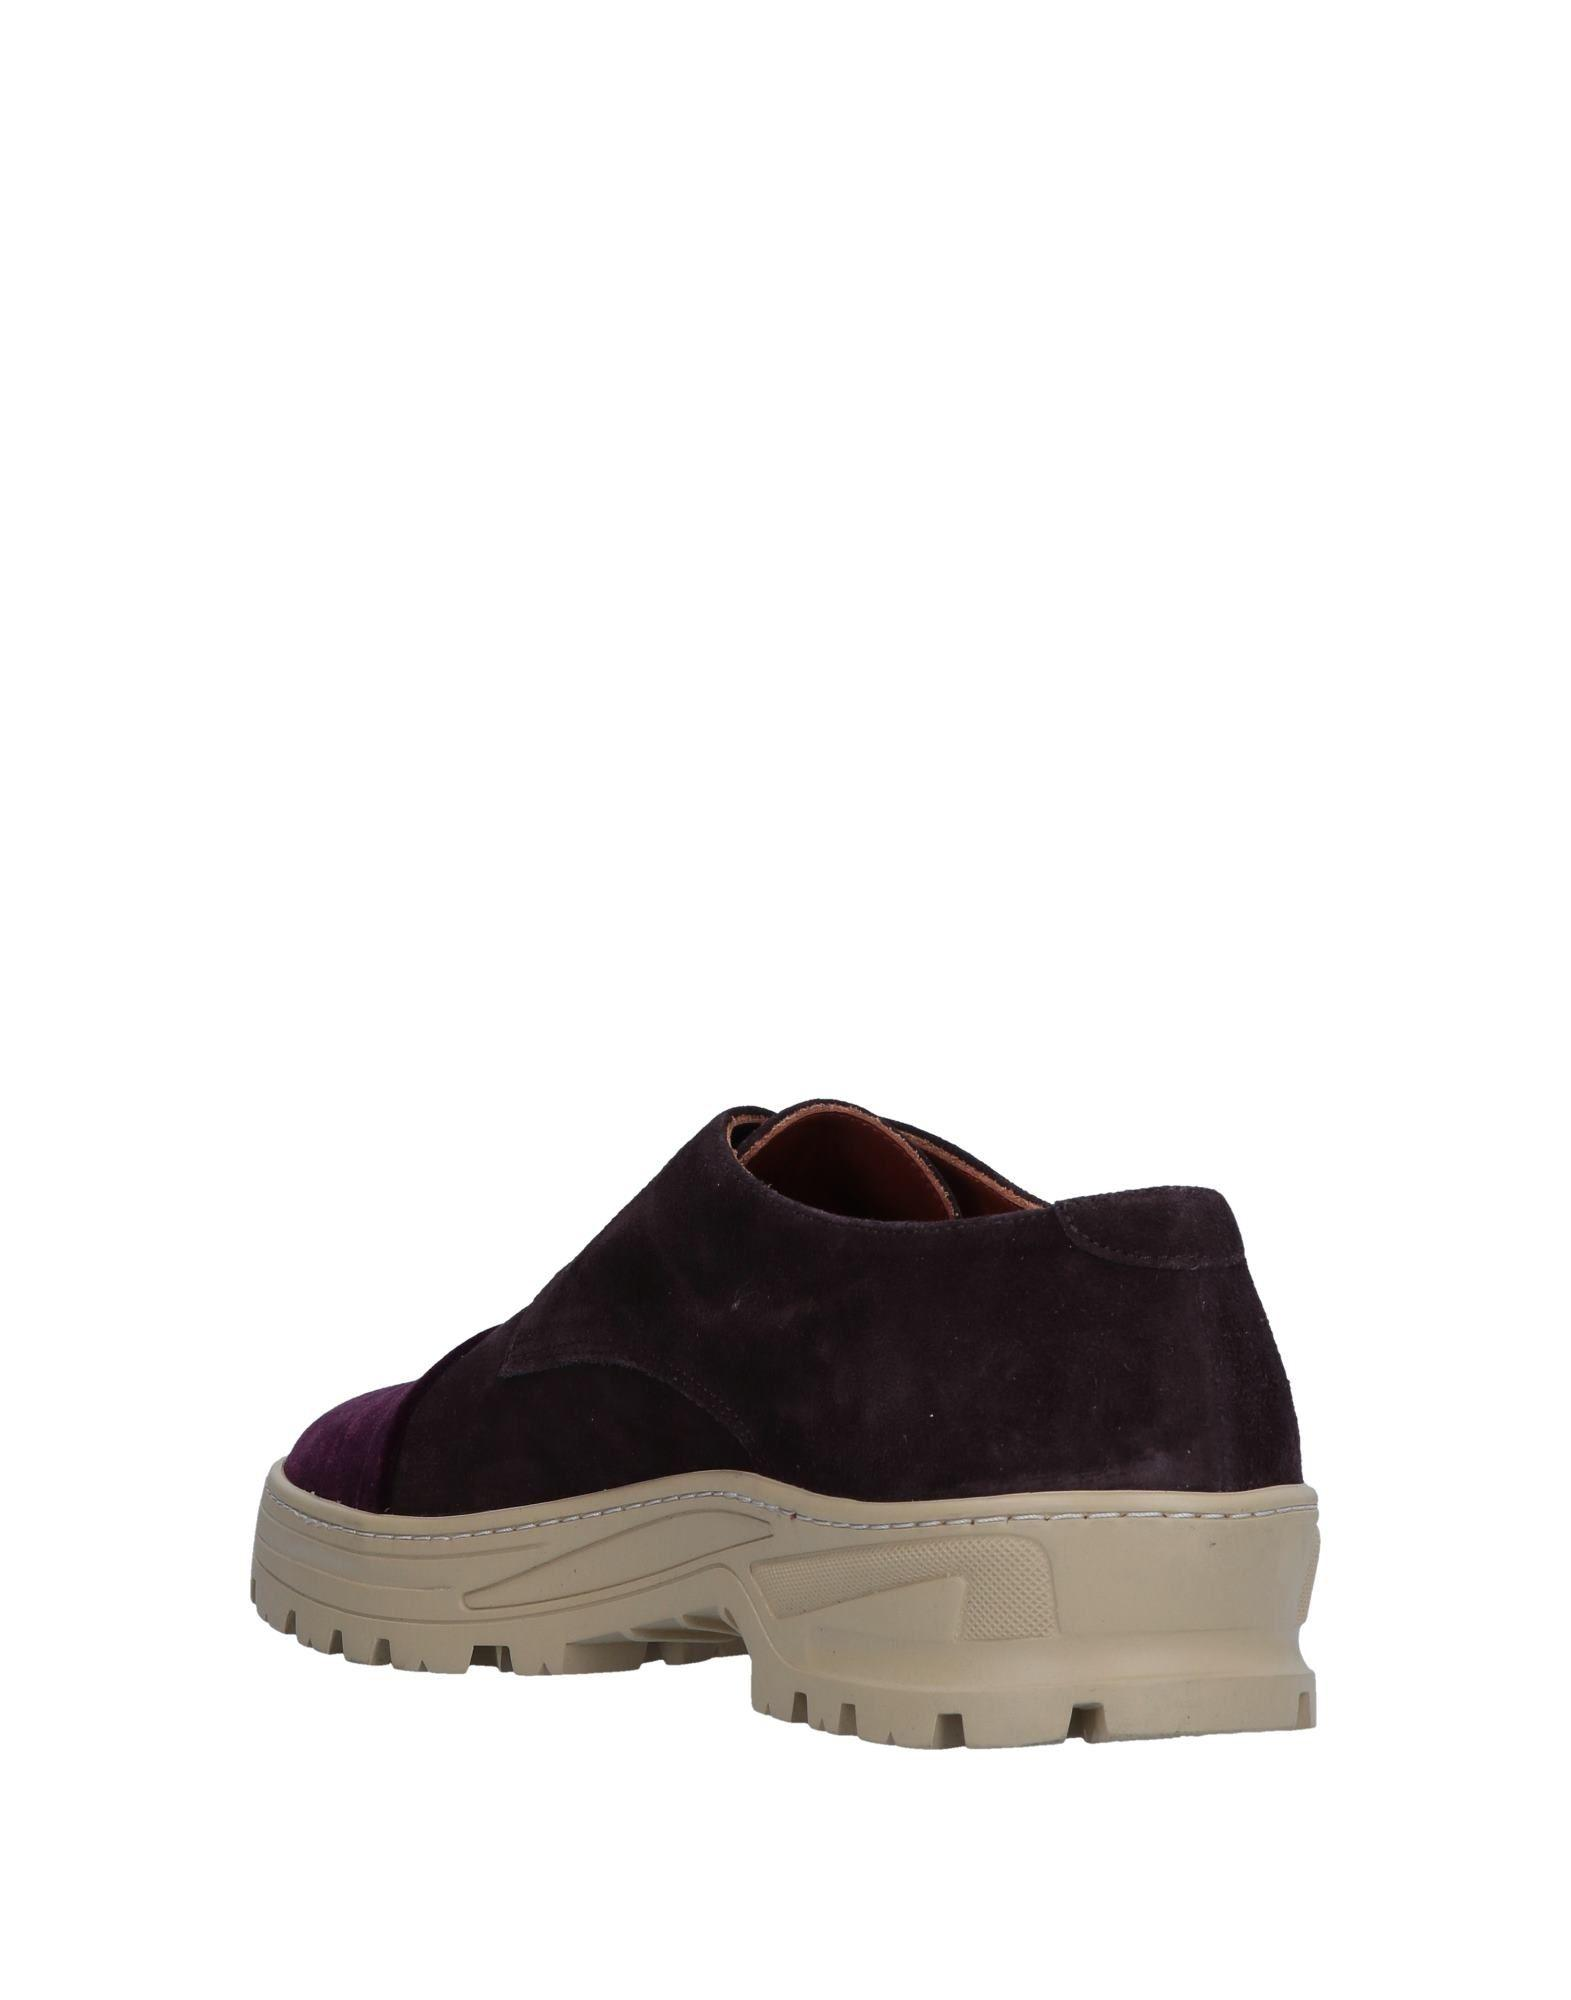 b068de7a5182b0 Lyst - Missoni Lace-up Shoe in Purple for Men